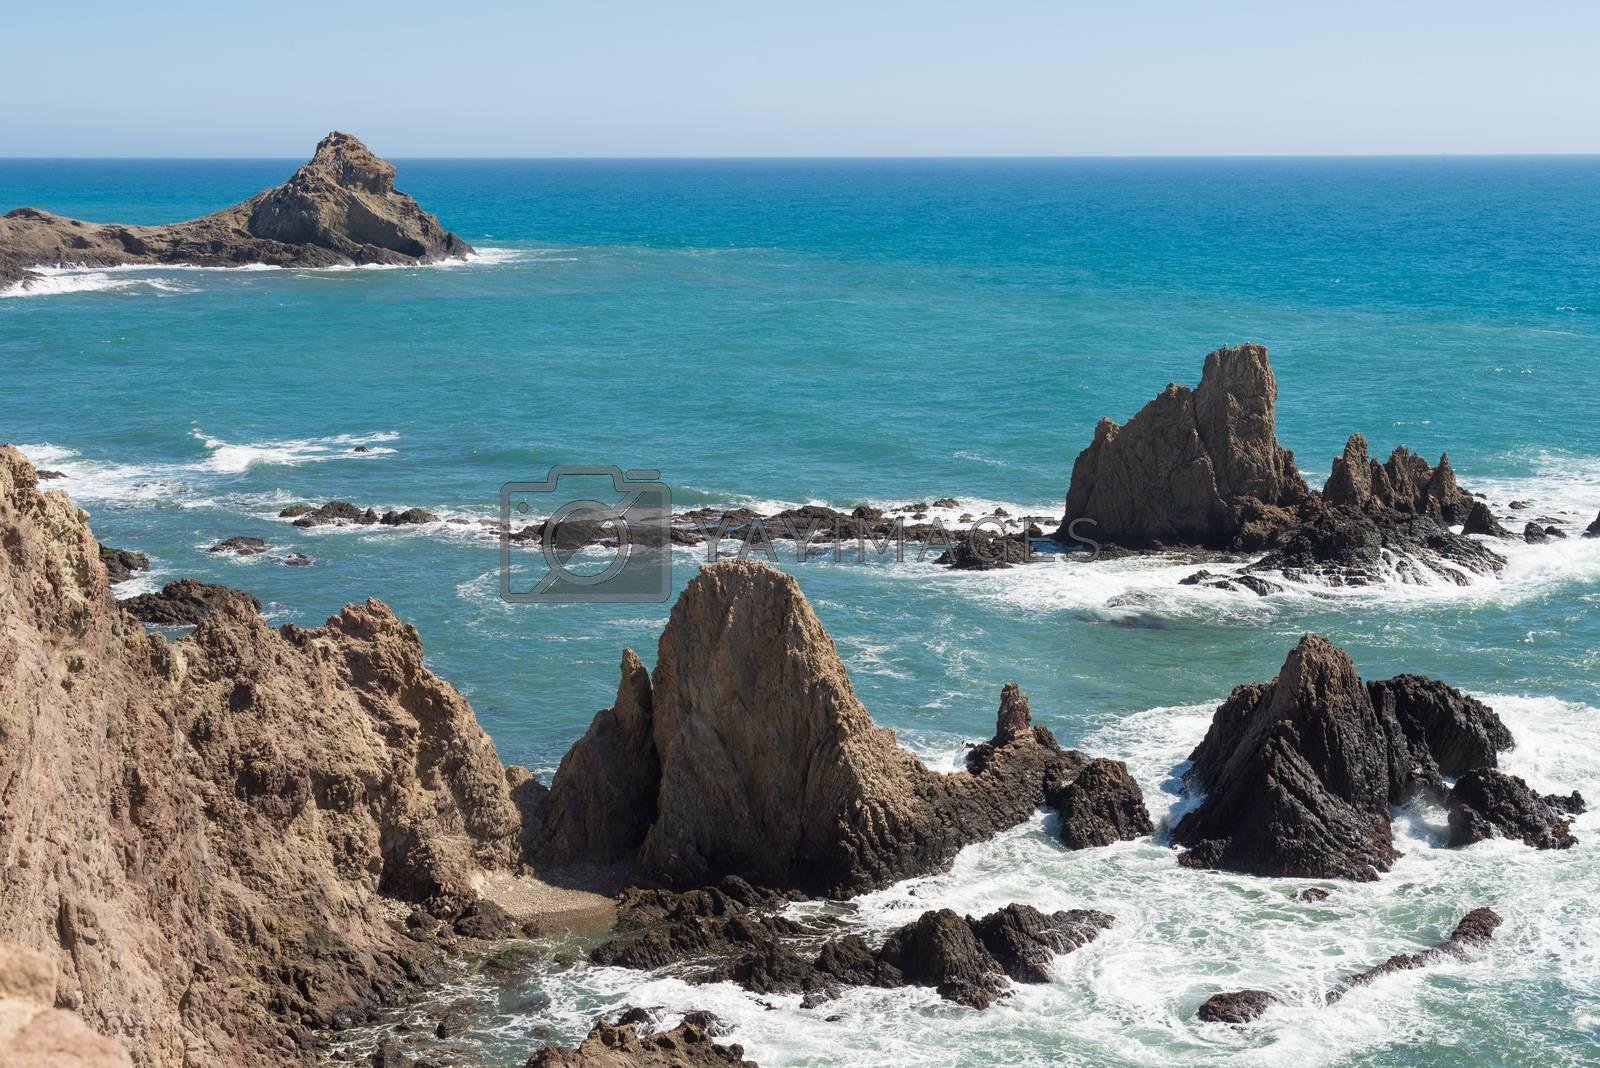 Royalty free image of Rocky coast by hemeroskopion